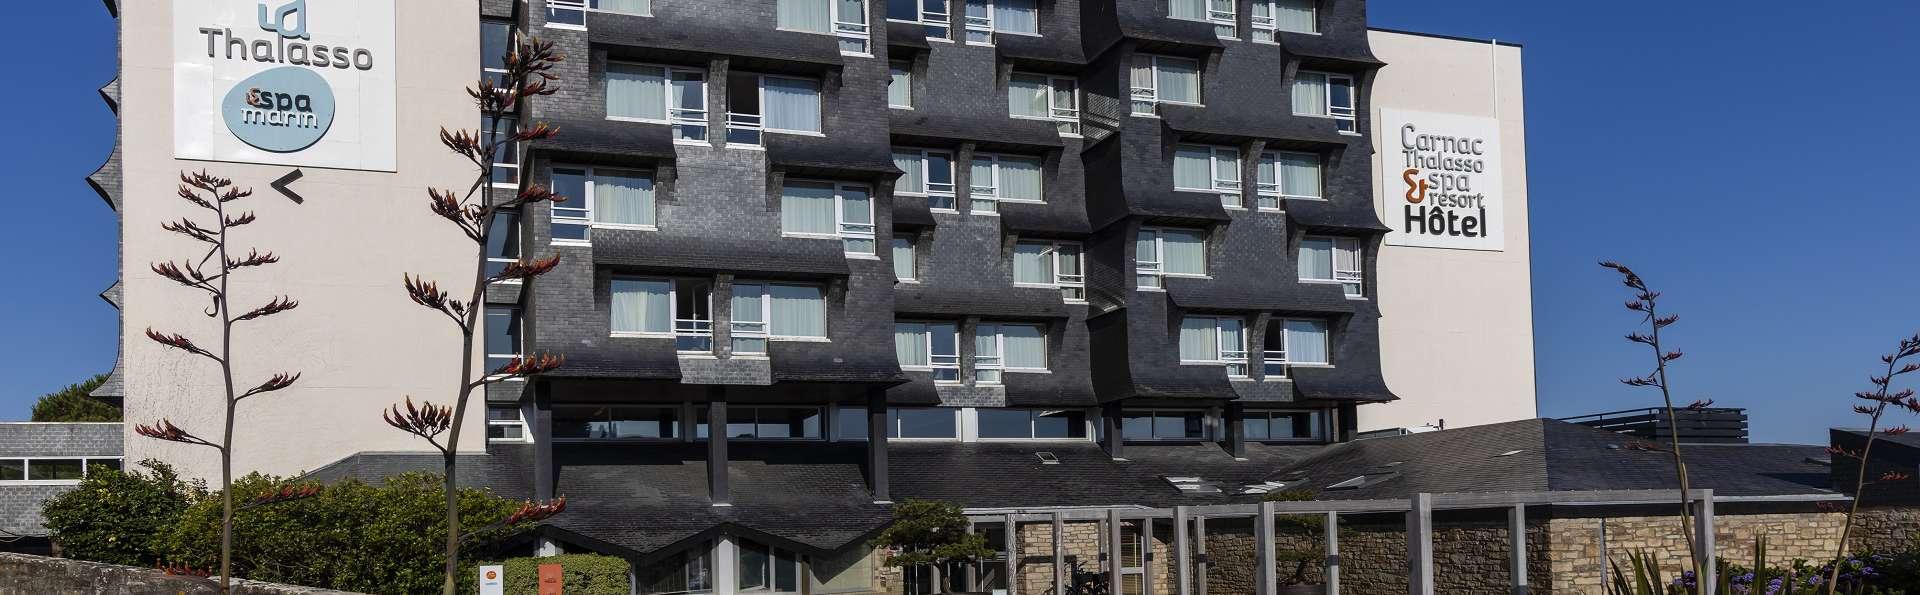 Hotel les Salines & Spa Resort by Thalazur - thalazur_carnac_exterieur_2019-les-salines-027.jpg